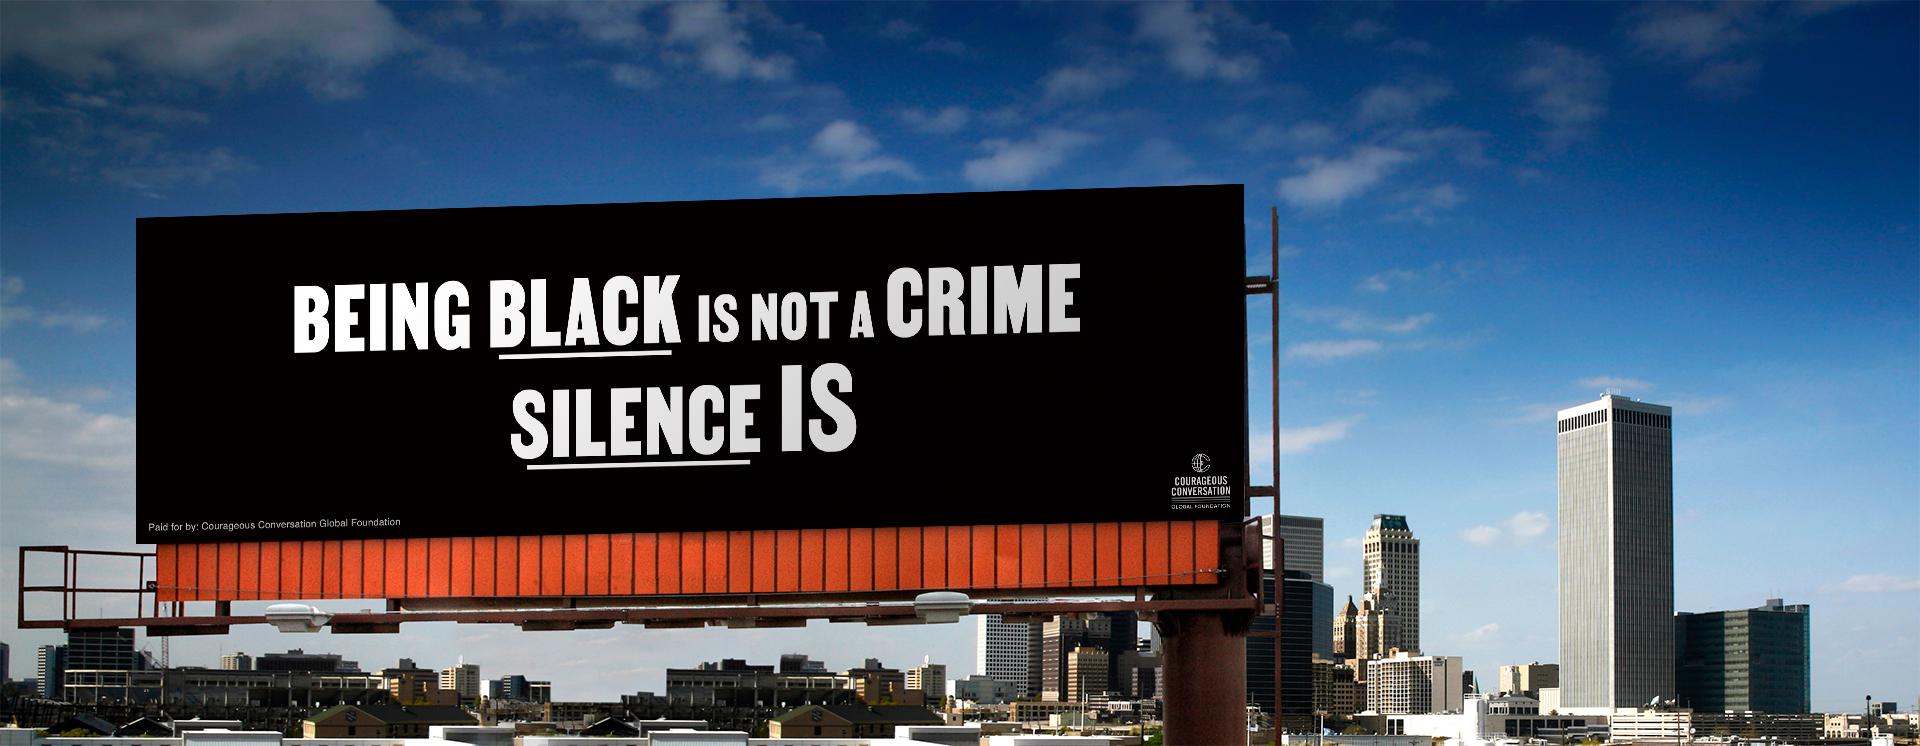 Not a Crime Outdoor Ad